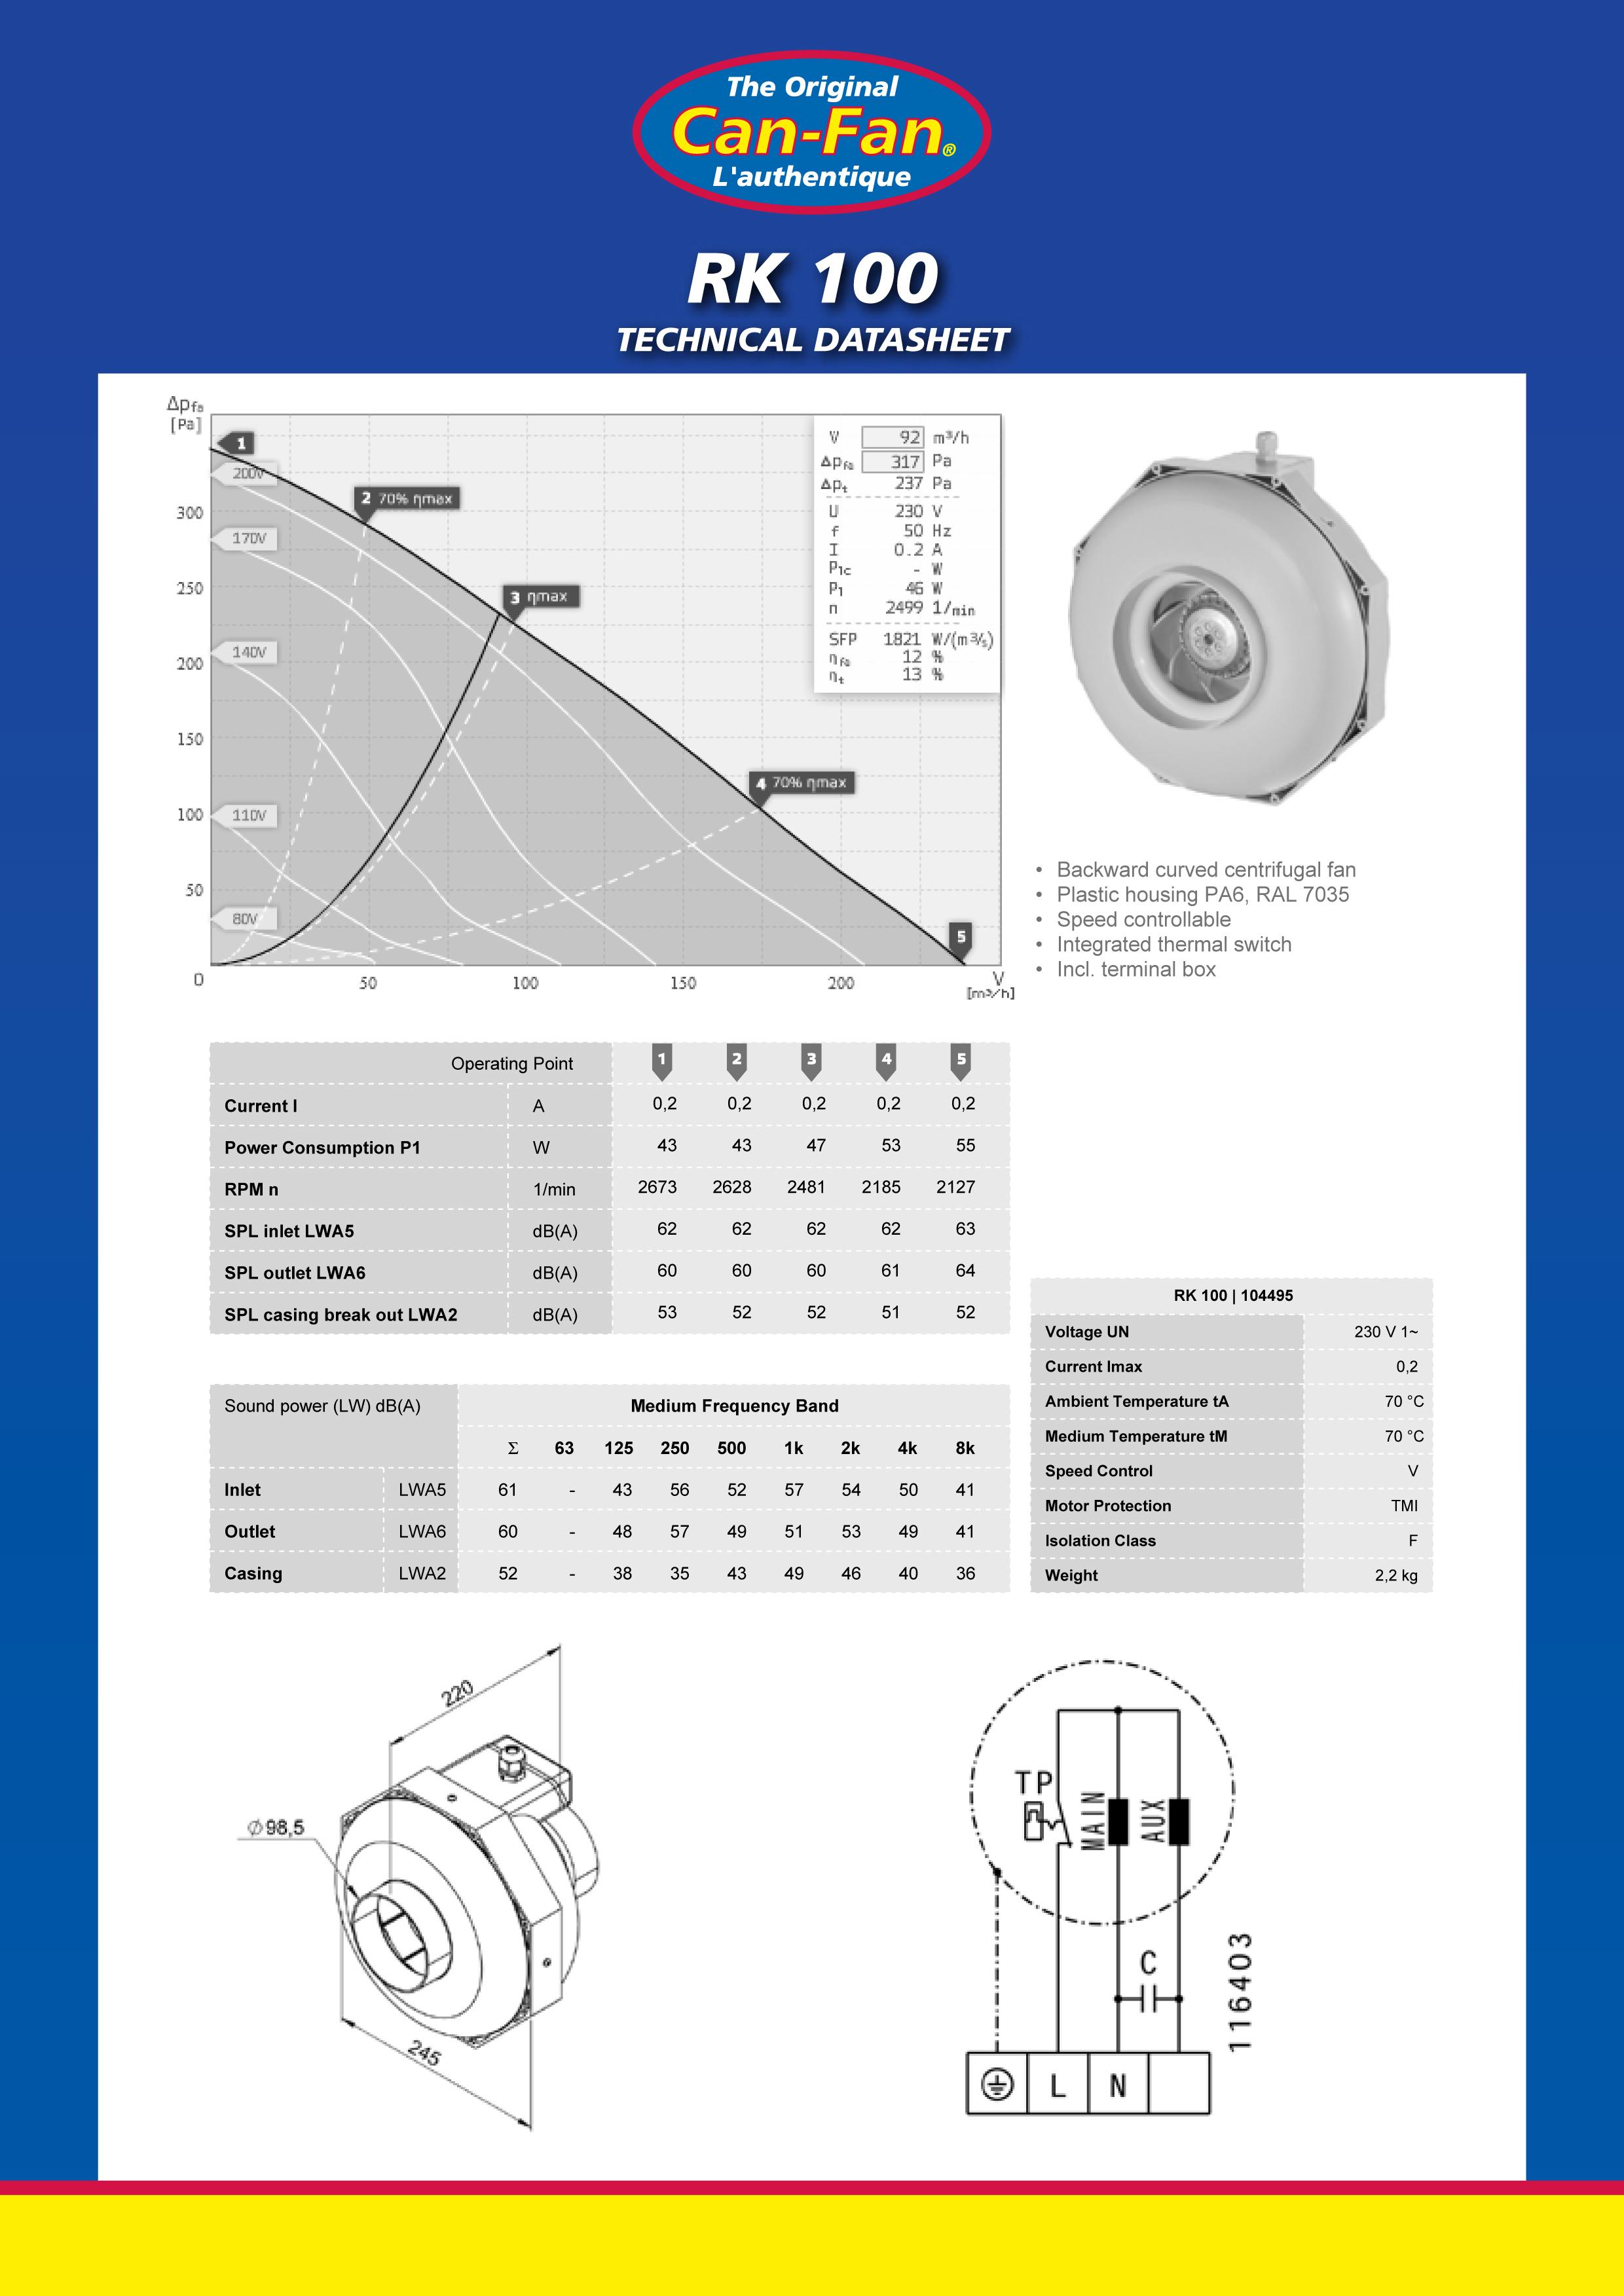 Вентилятор вытяжной Can-Fan RK 100 (диаметр 100 мм.)